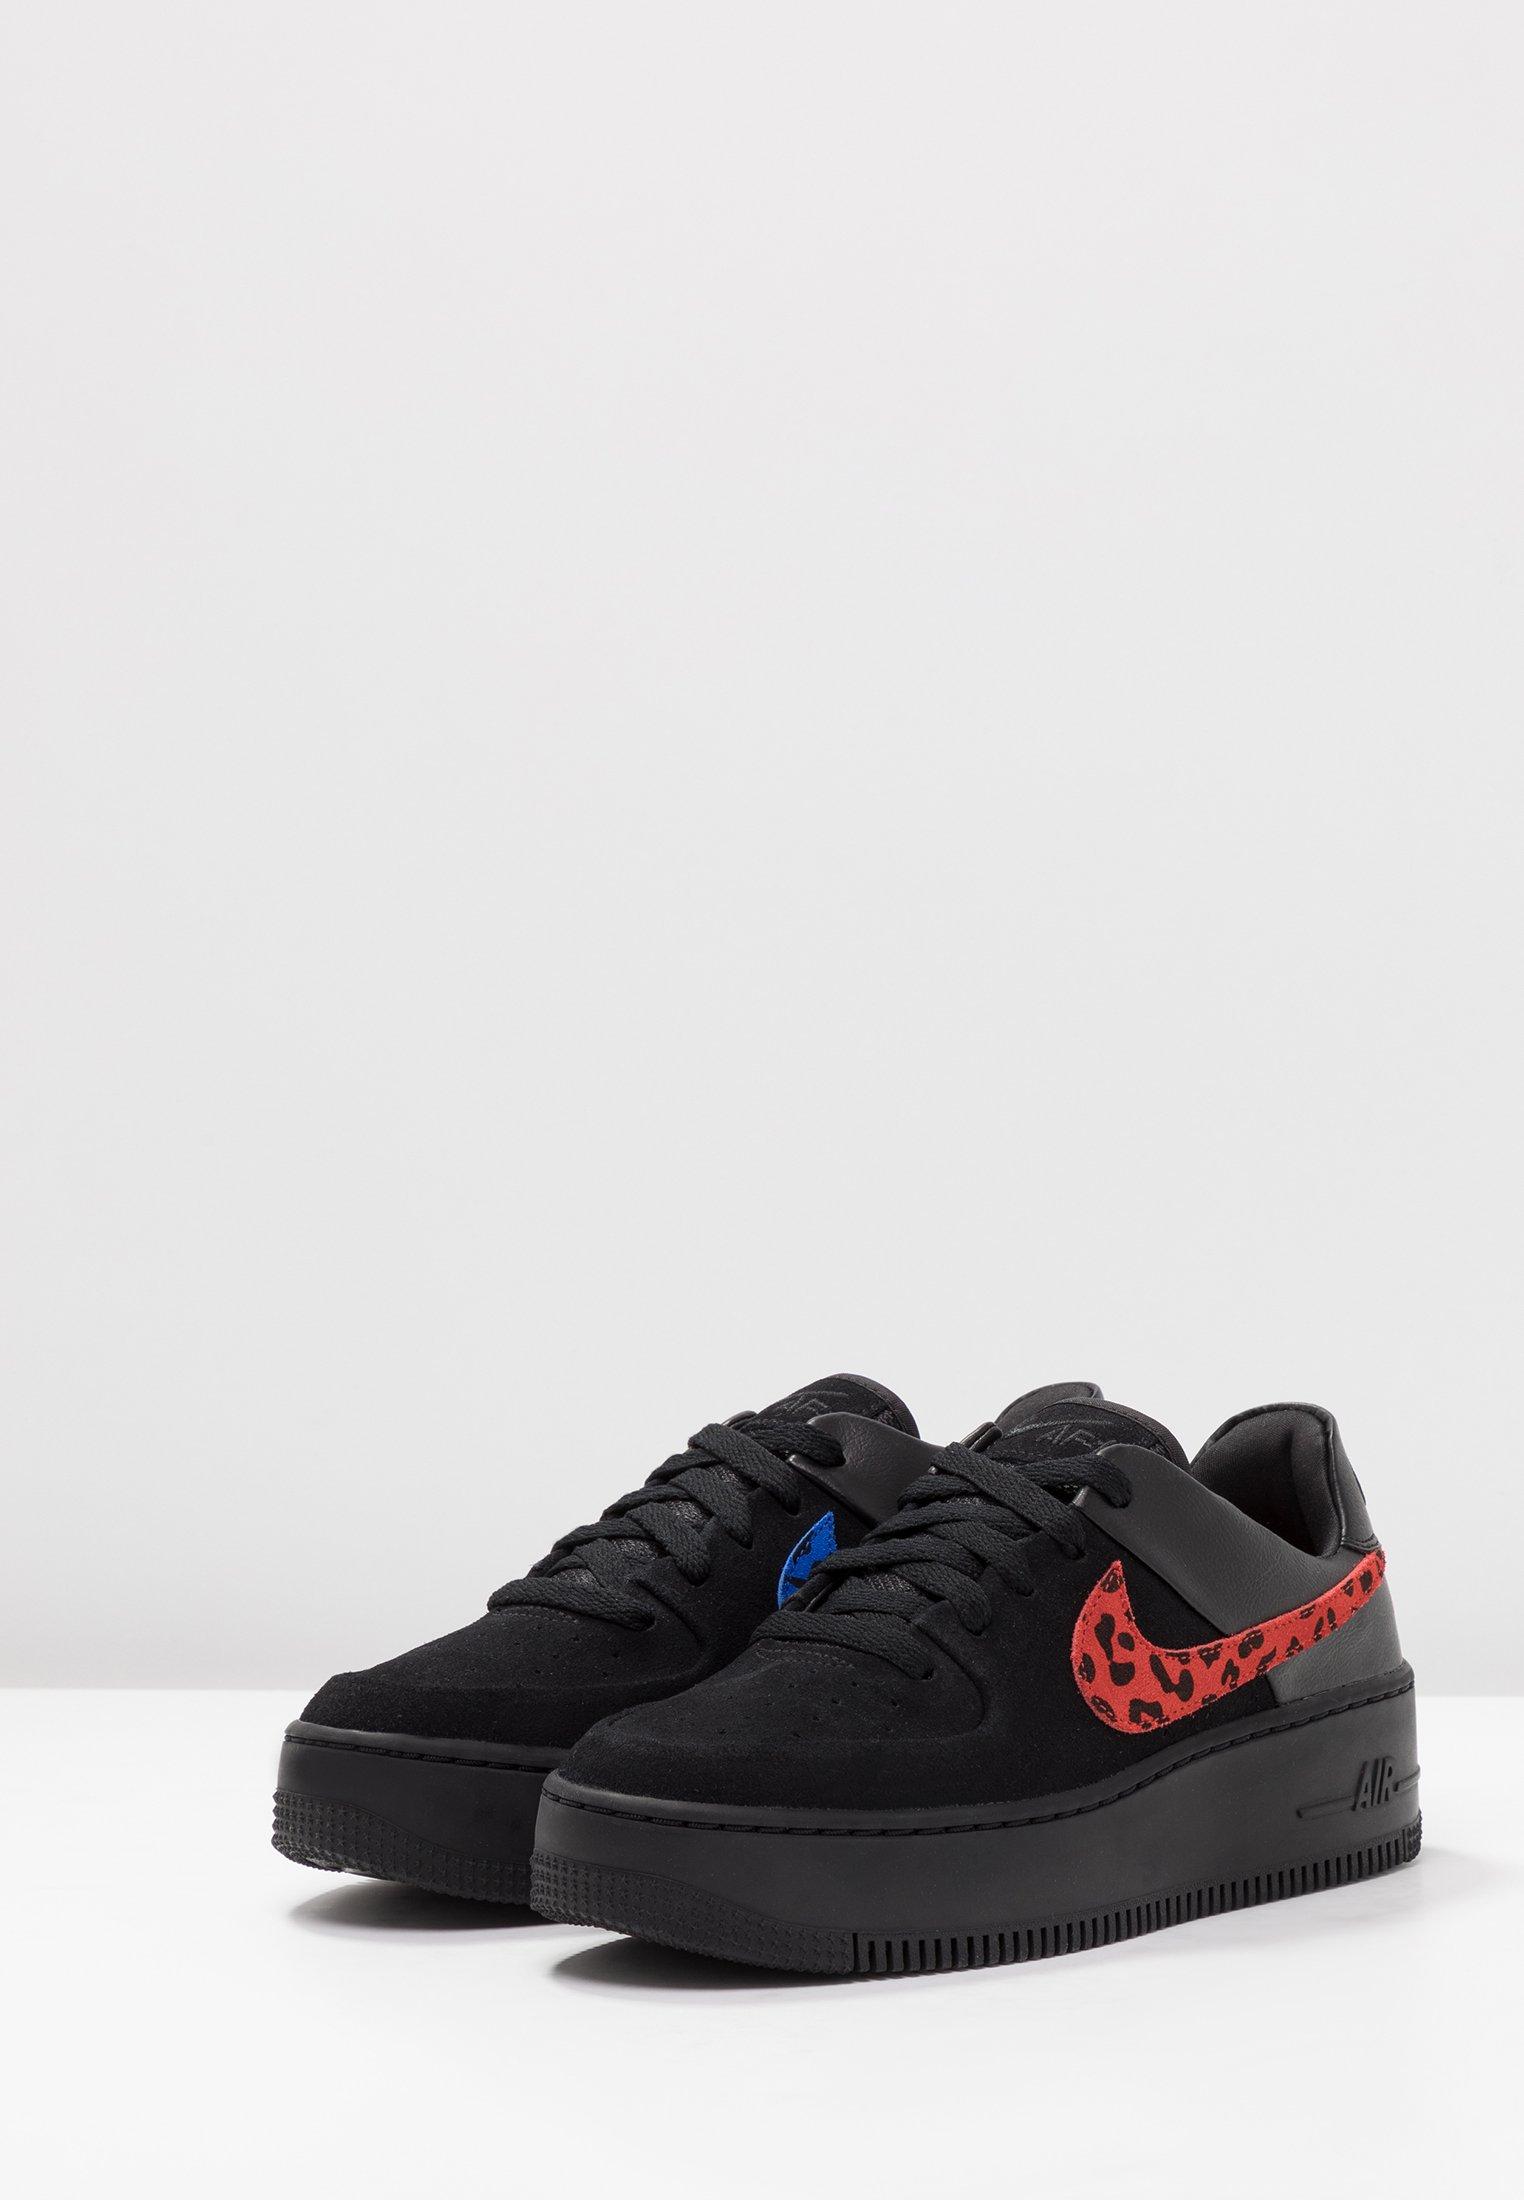 Force SageBaskets Air Red habanero Black 1 Nike Basses Sportswear zMpSVqU